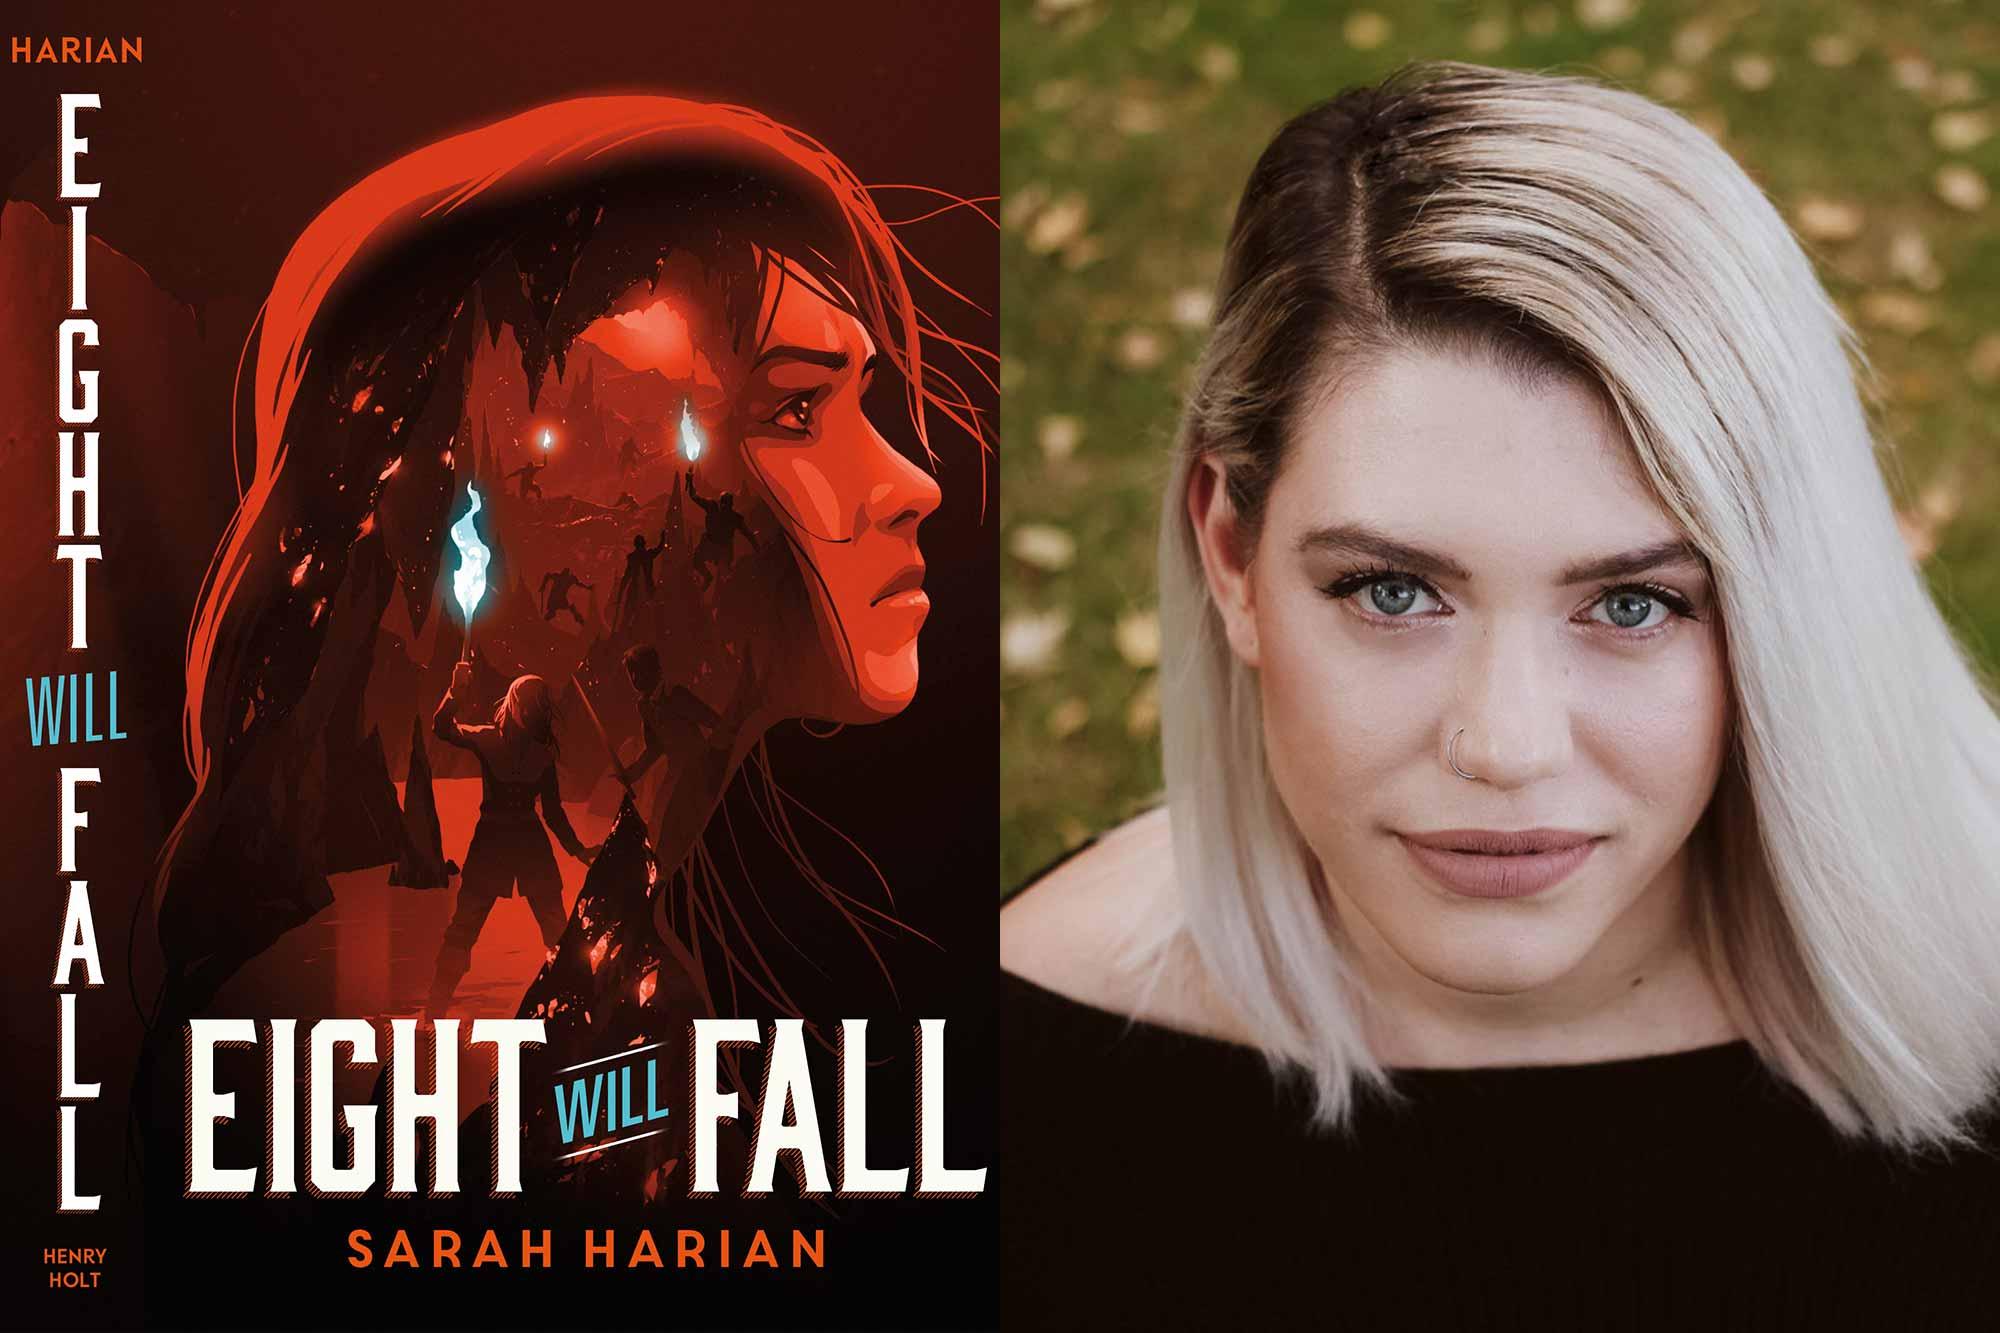 Sarah Harian on Eight Will Fall